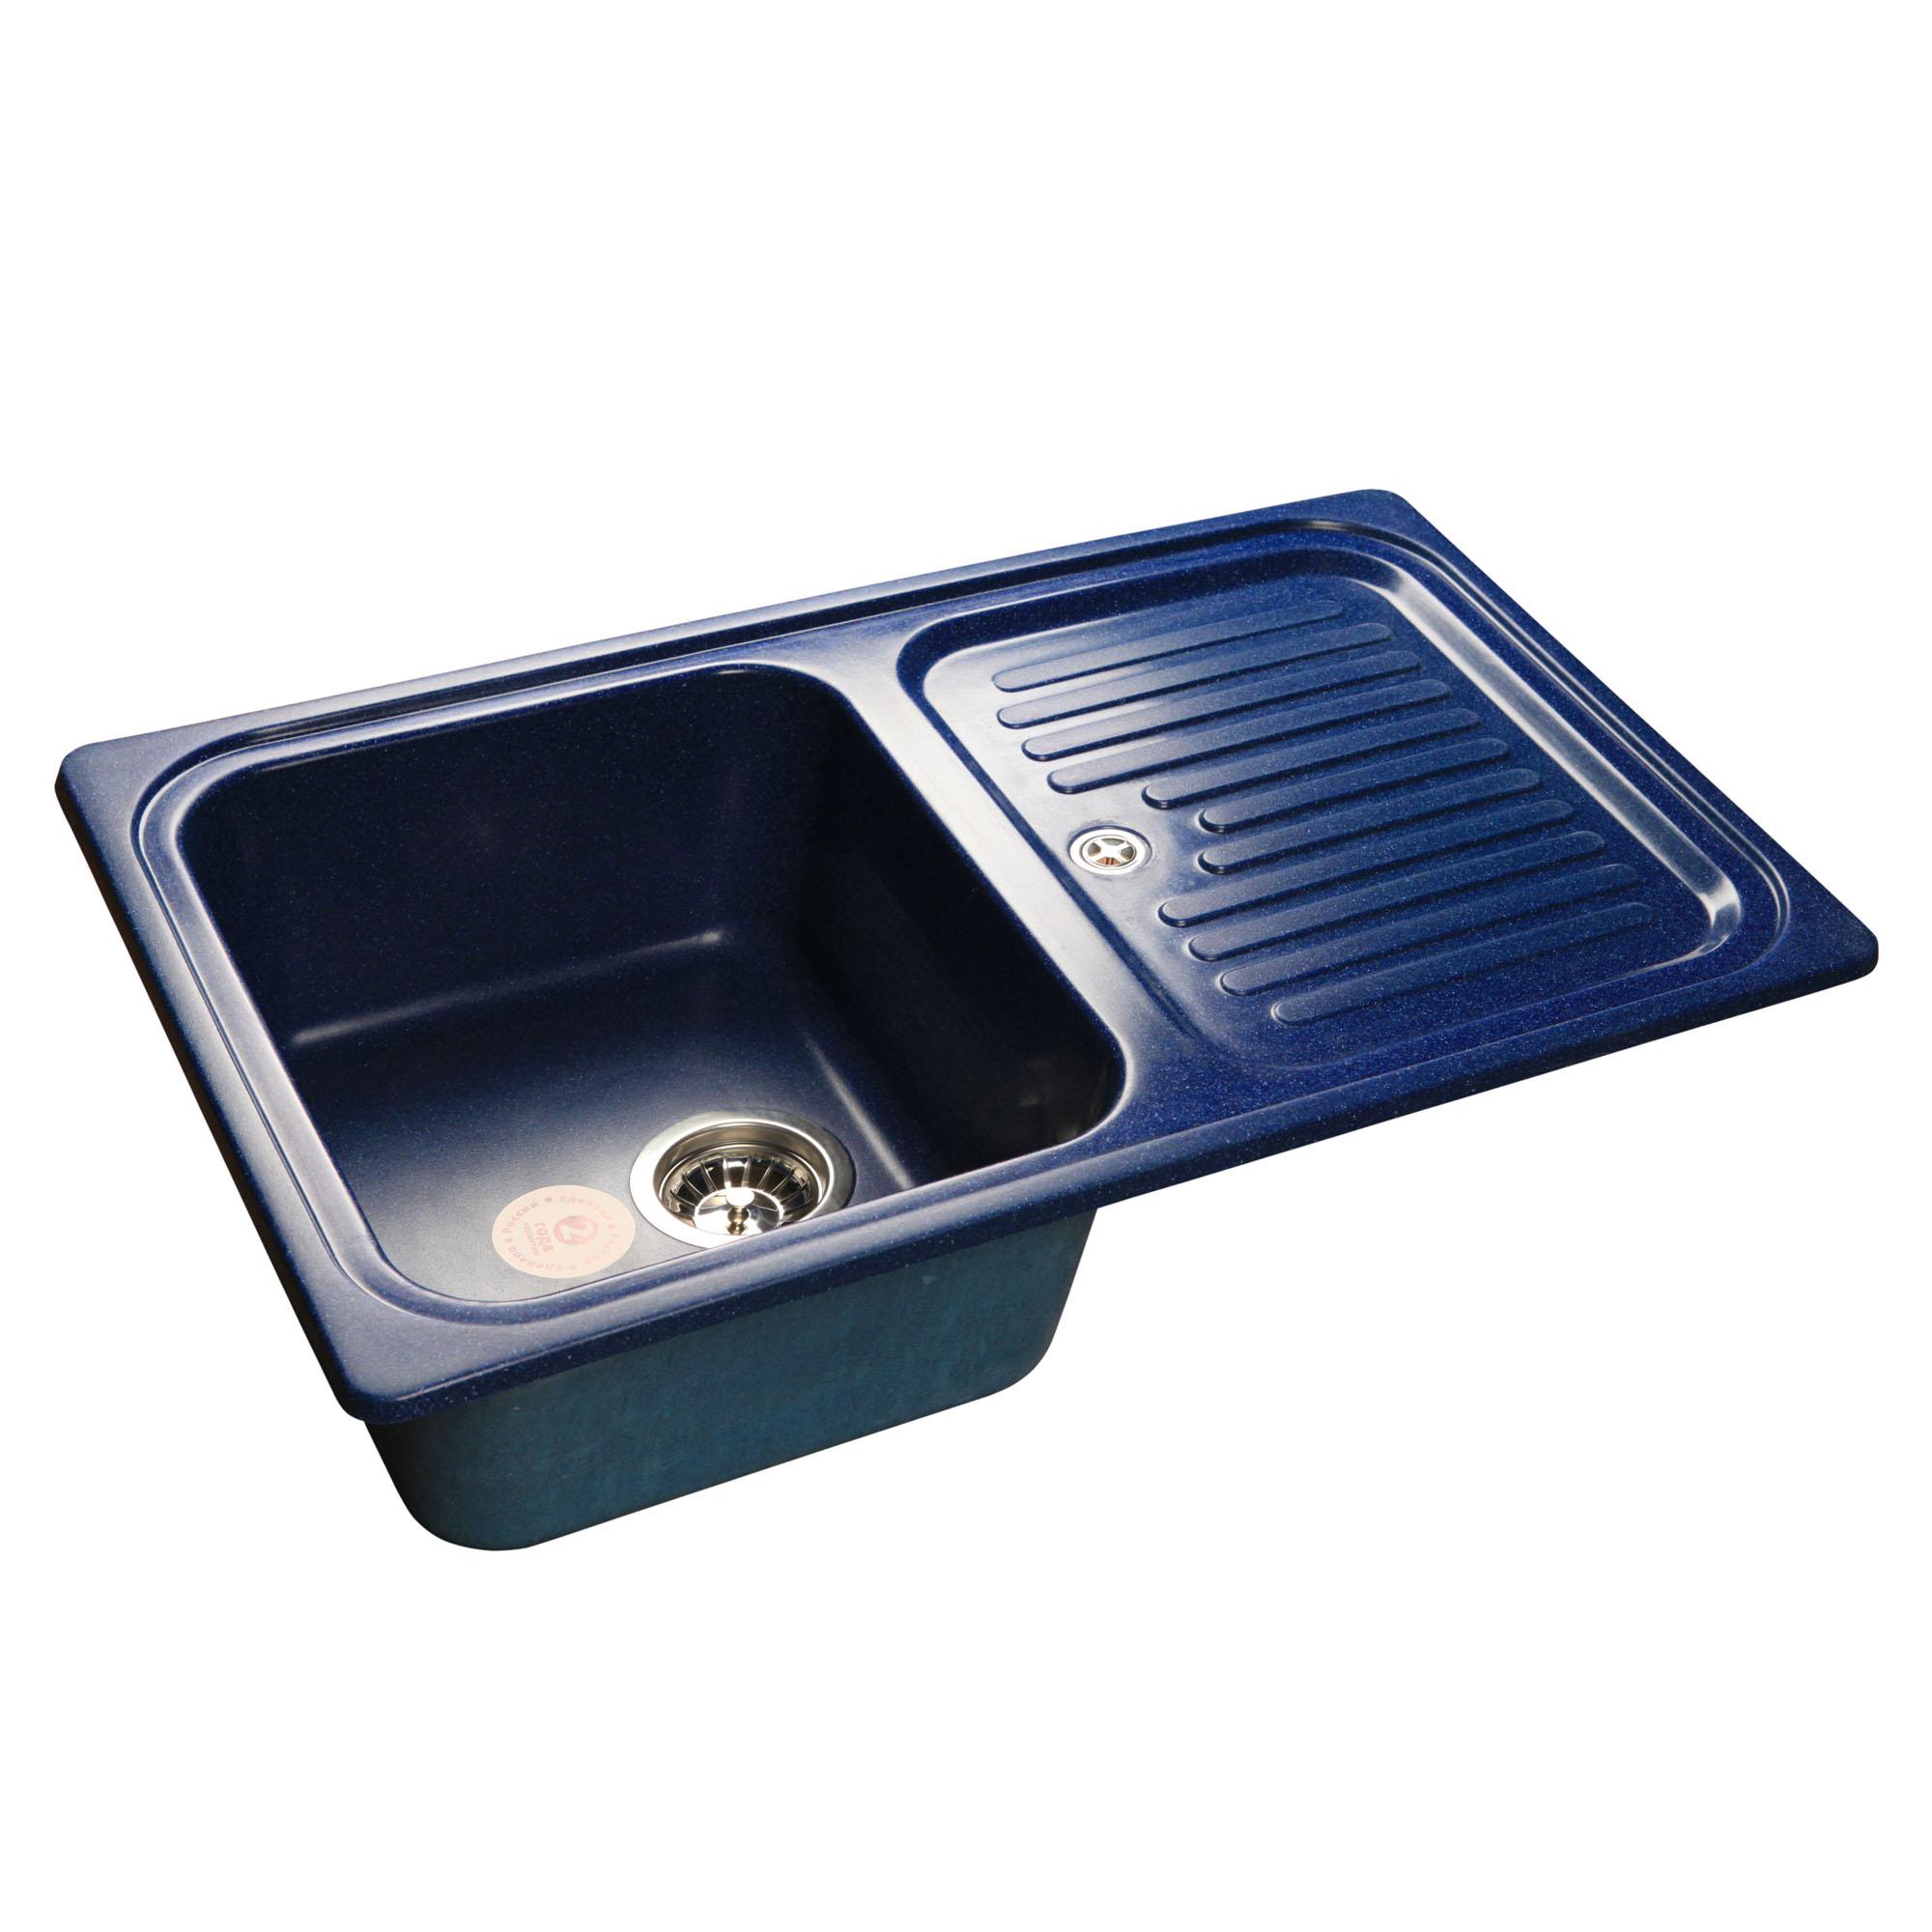 Кухонная мойка GranFest Standart GF-S780L синий granfest gf s780l песочный